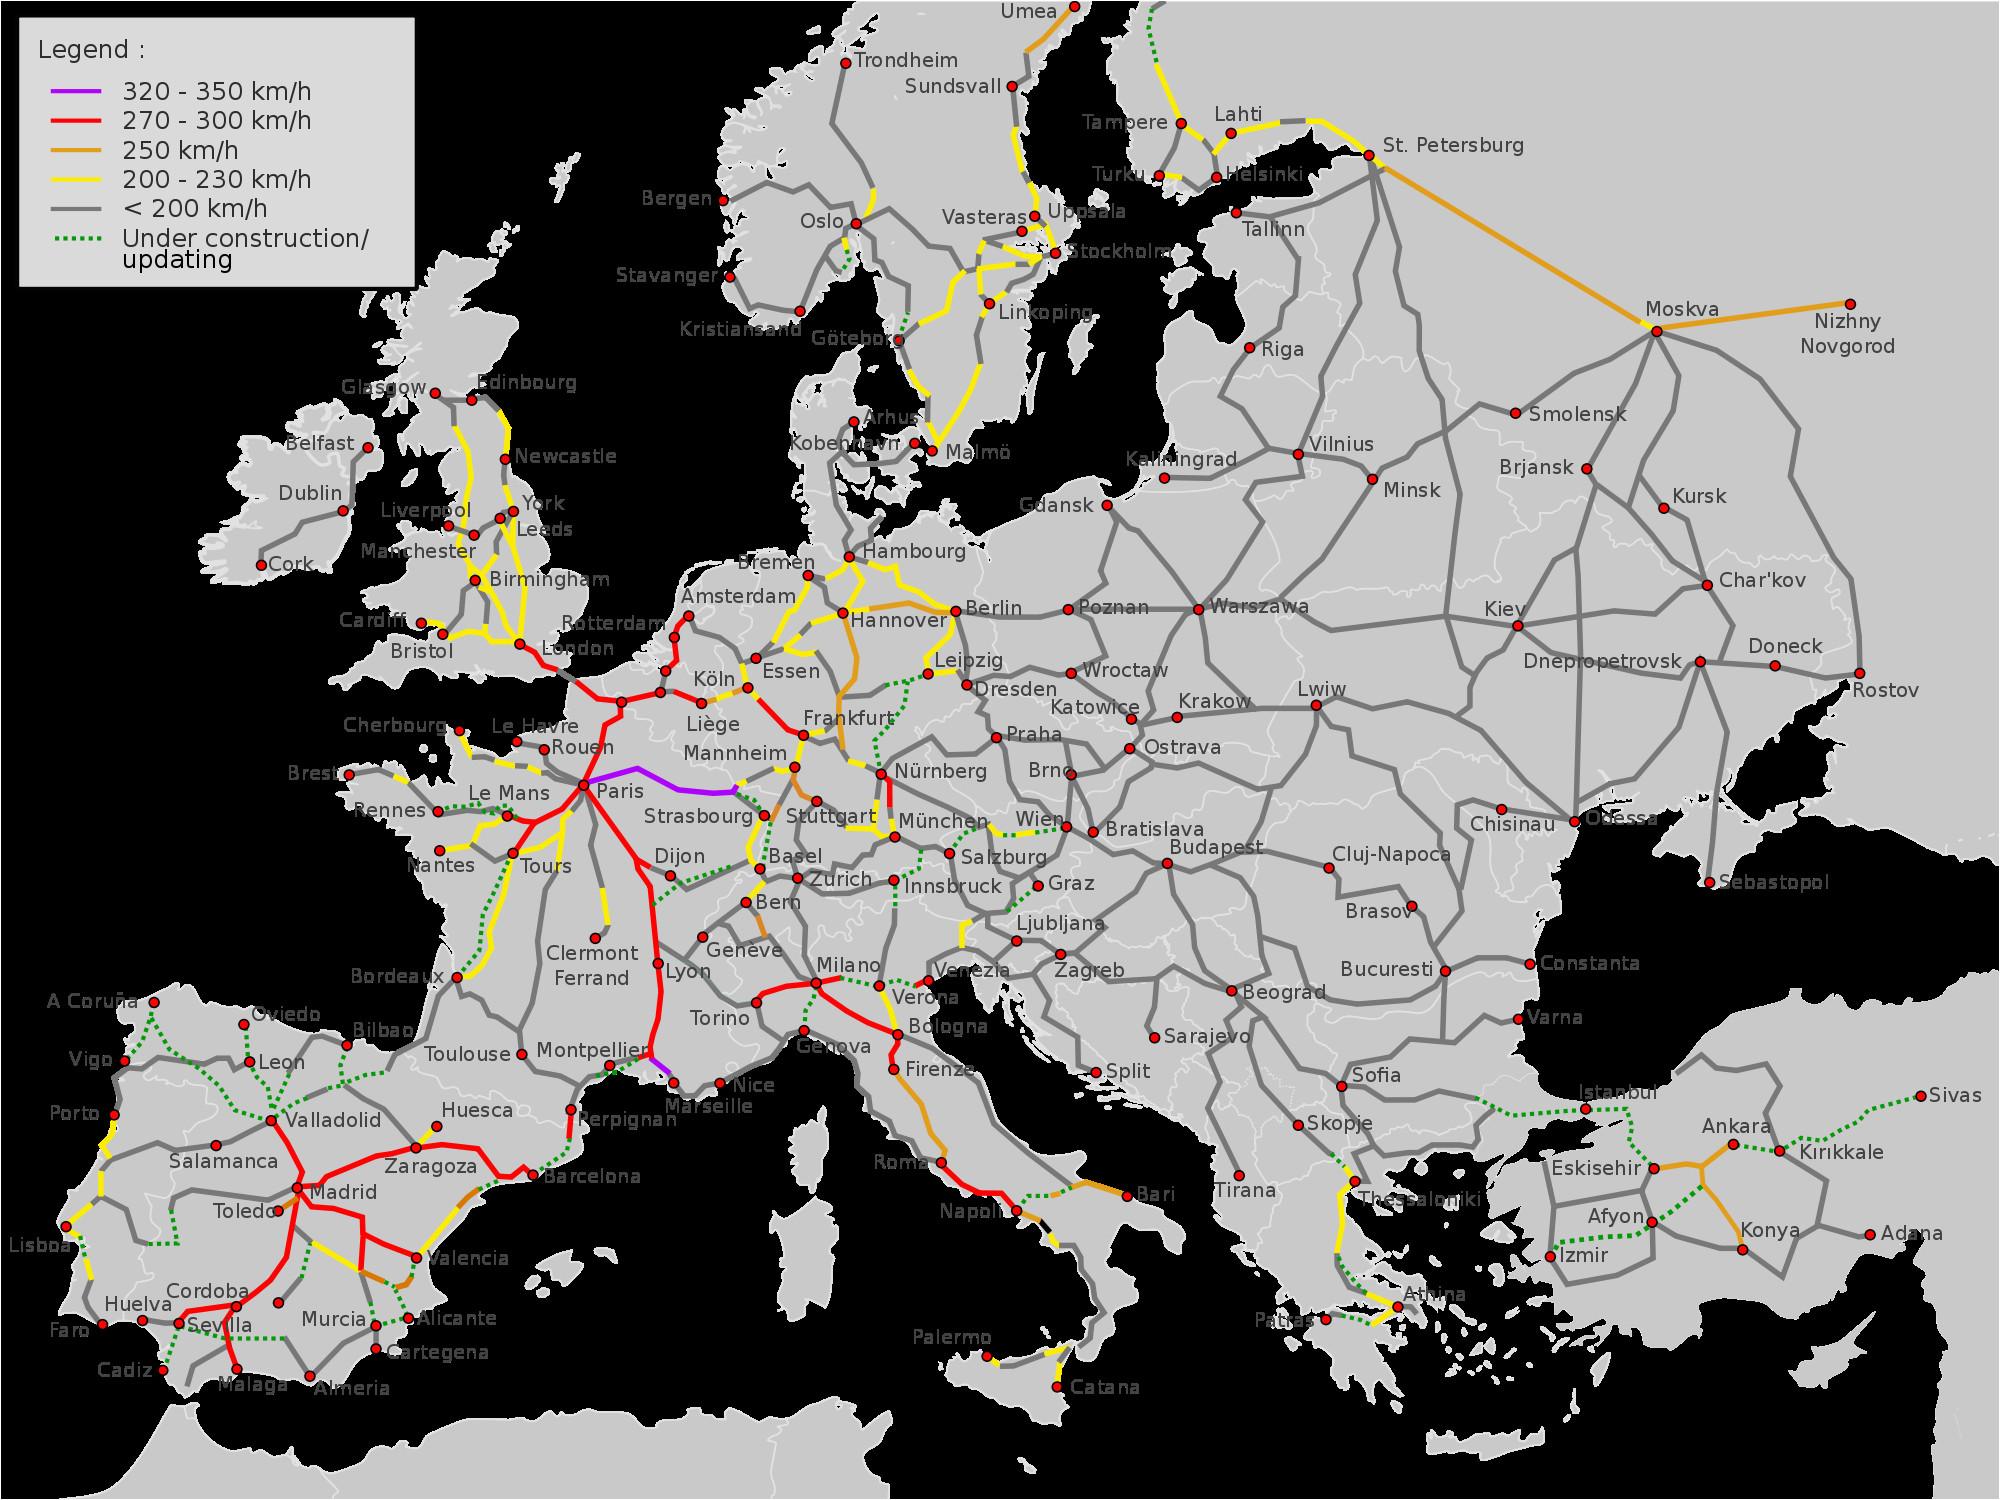 eu hsr network plan infrastructure of china map diagram europe